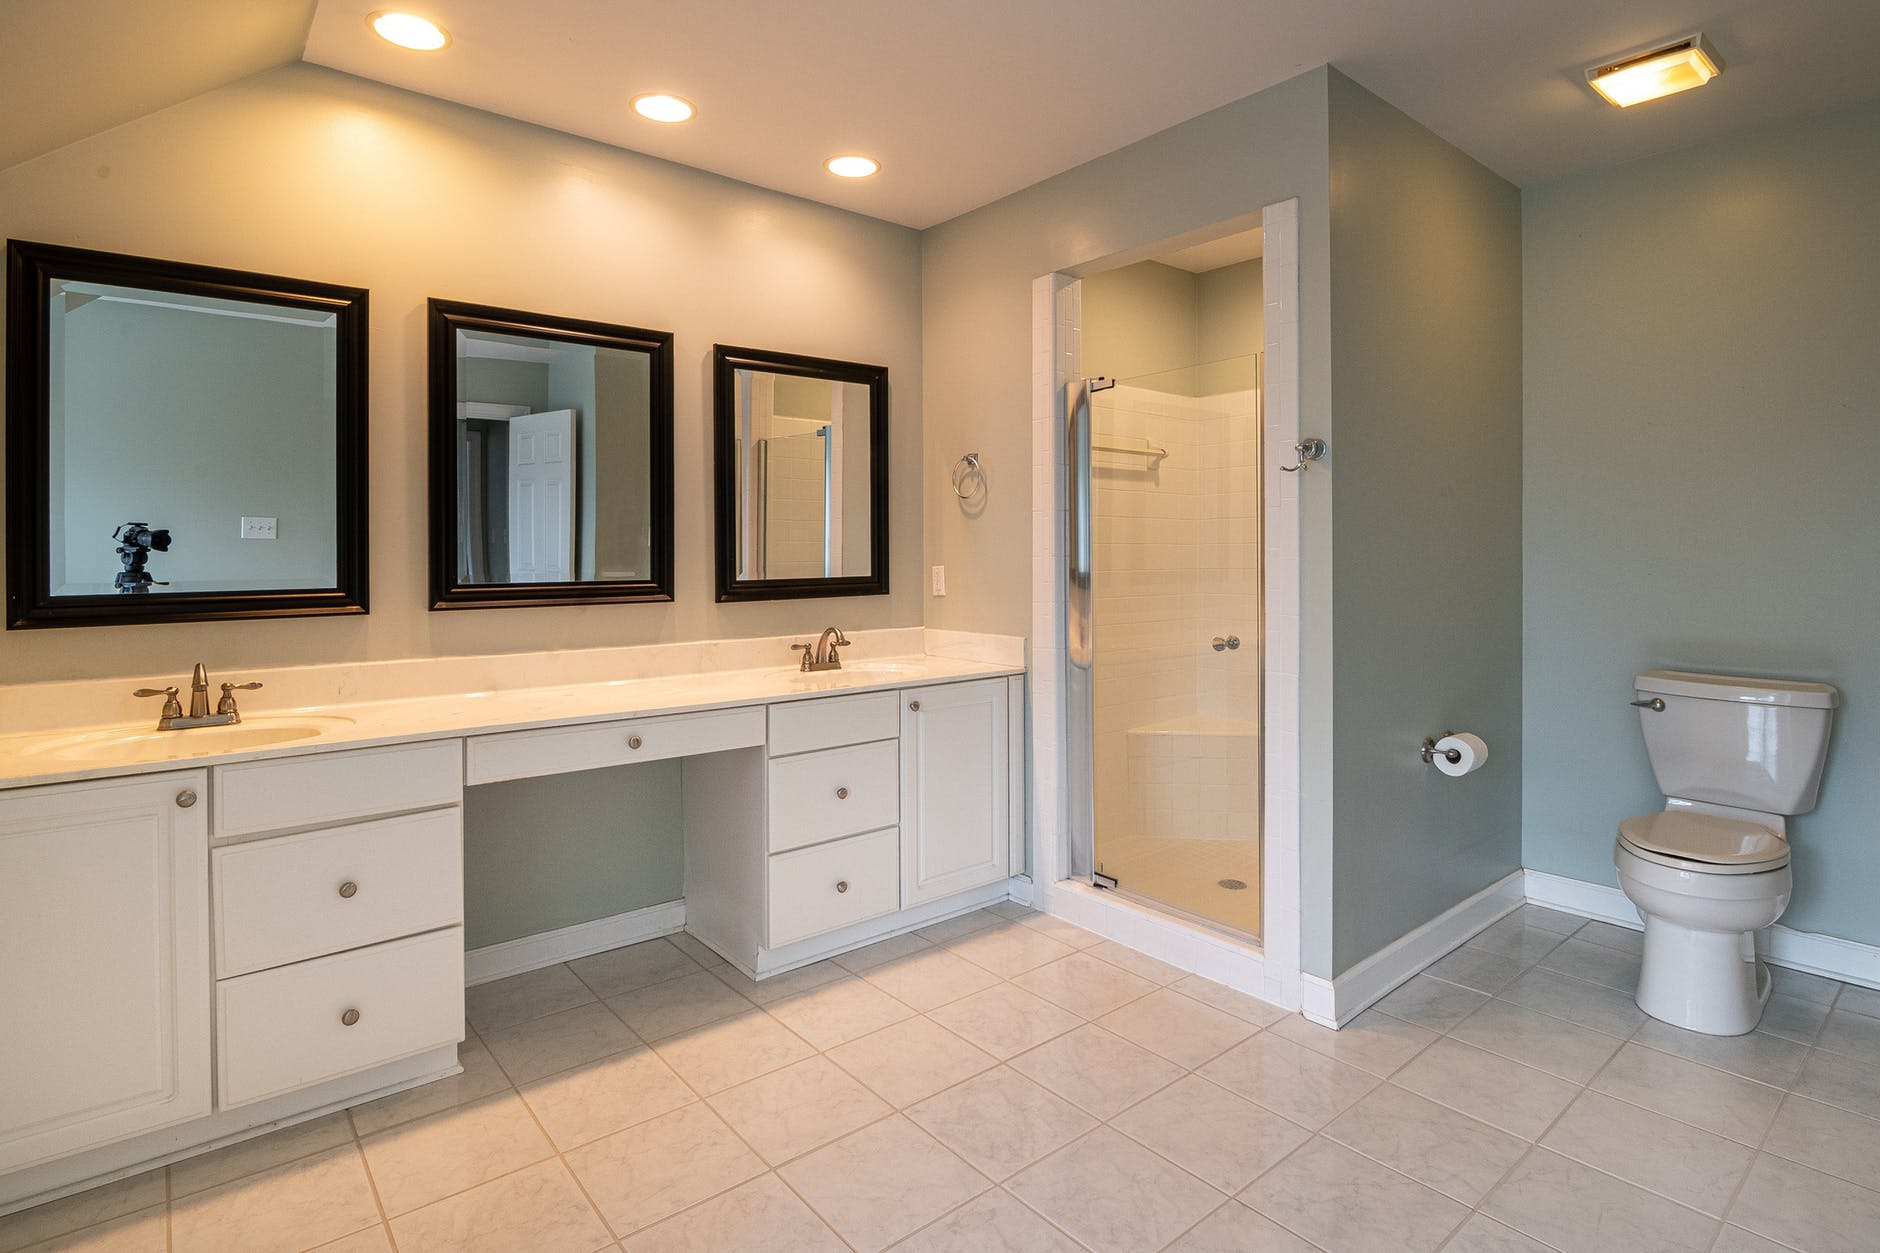 Bathroom flooring ideas with ceramic tiles